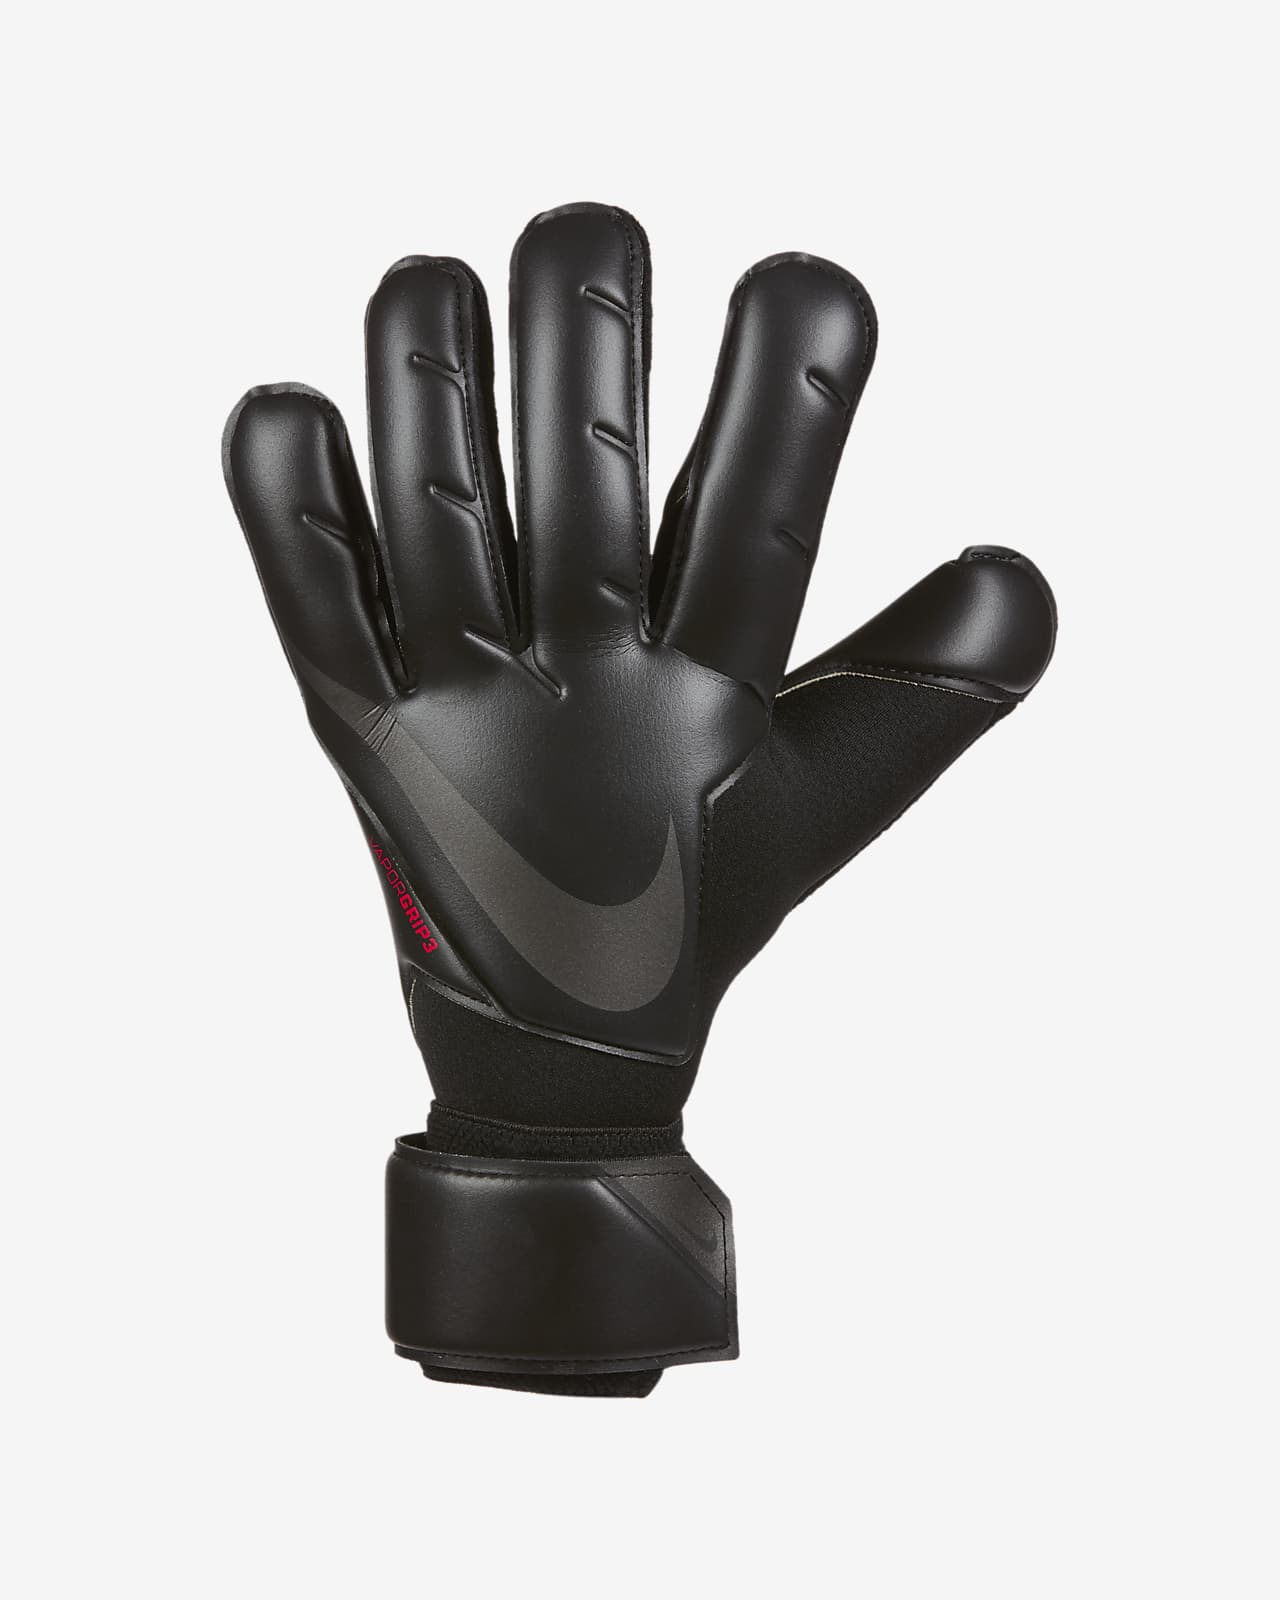 Футбольные перчатки Nike Goalkeeper Vapor Grip3